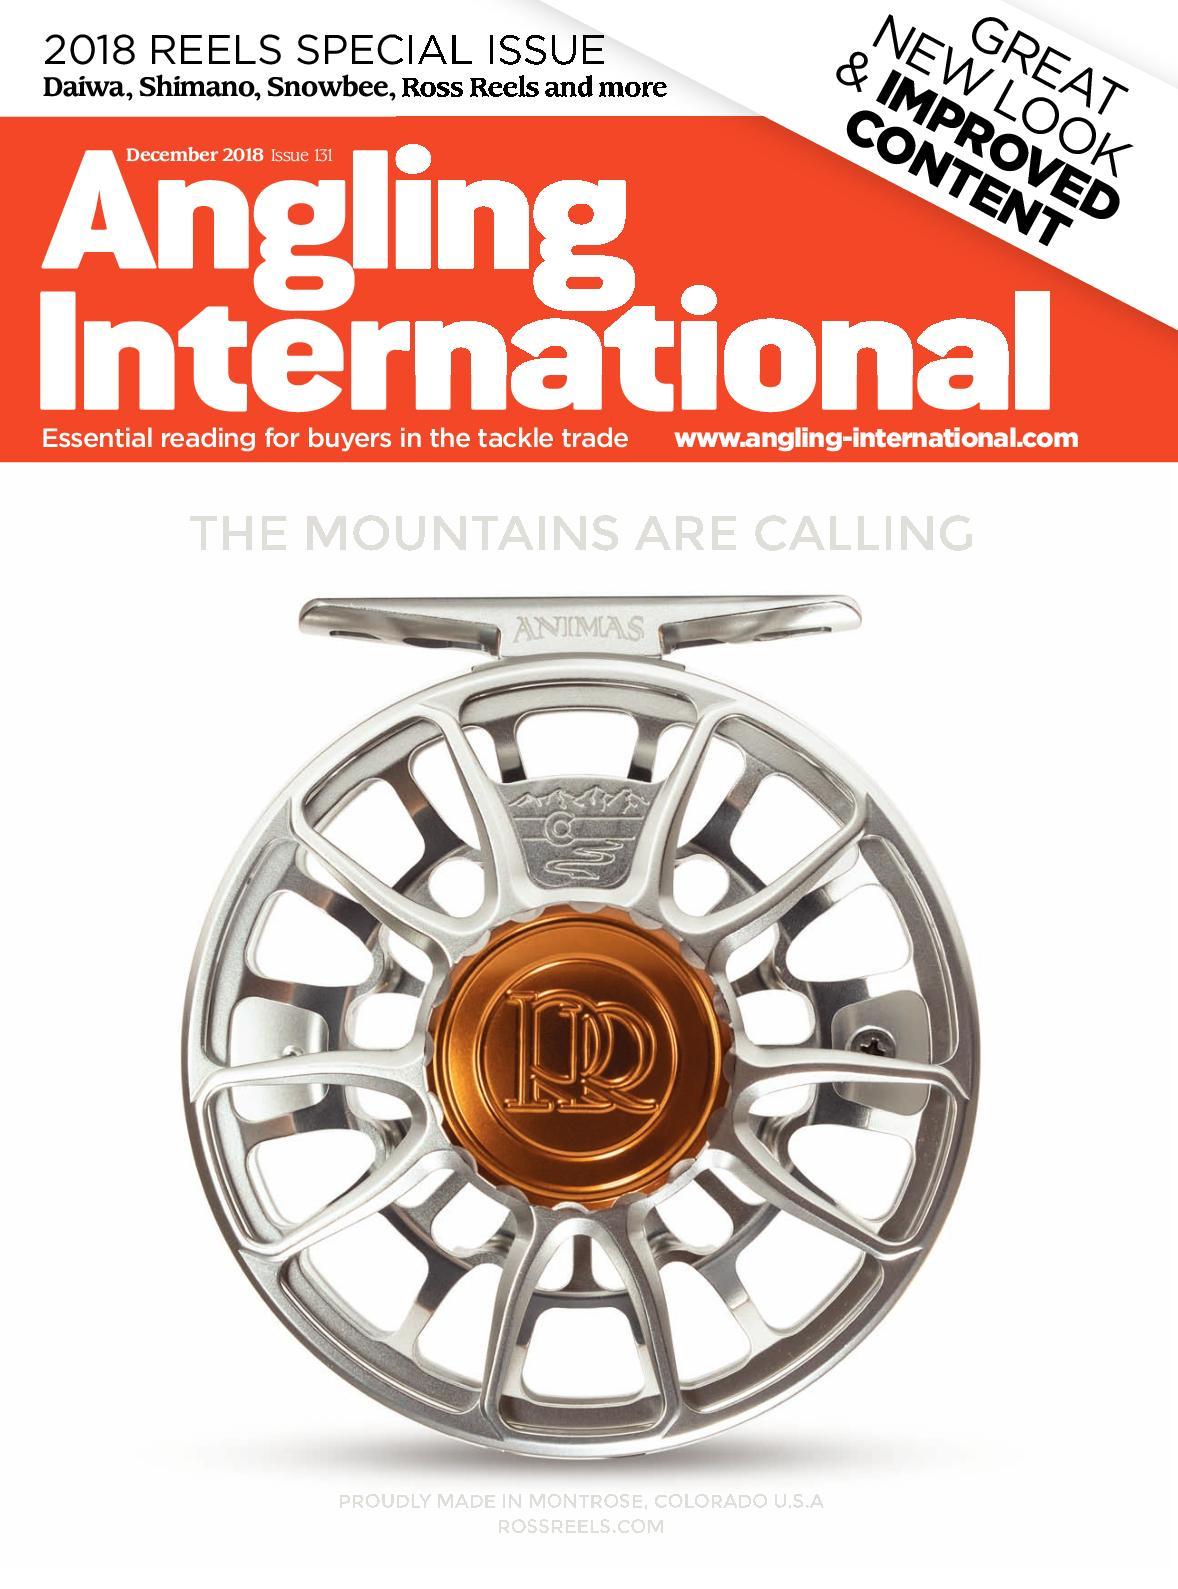 Calaméo - Angling International - December 2018 - issue 131